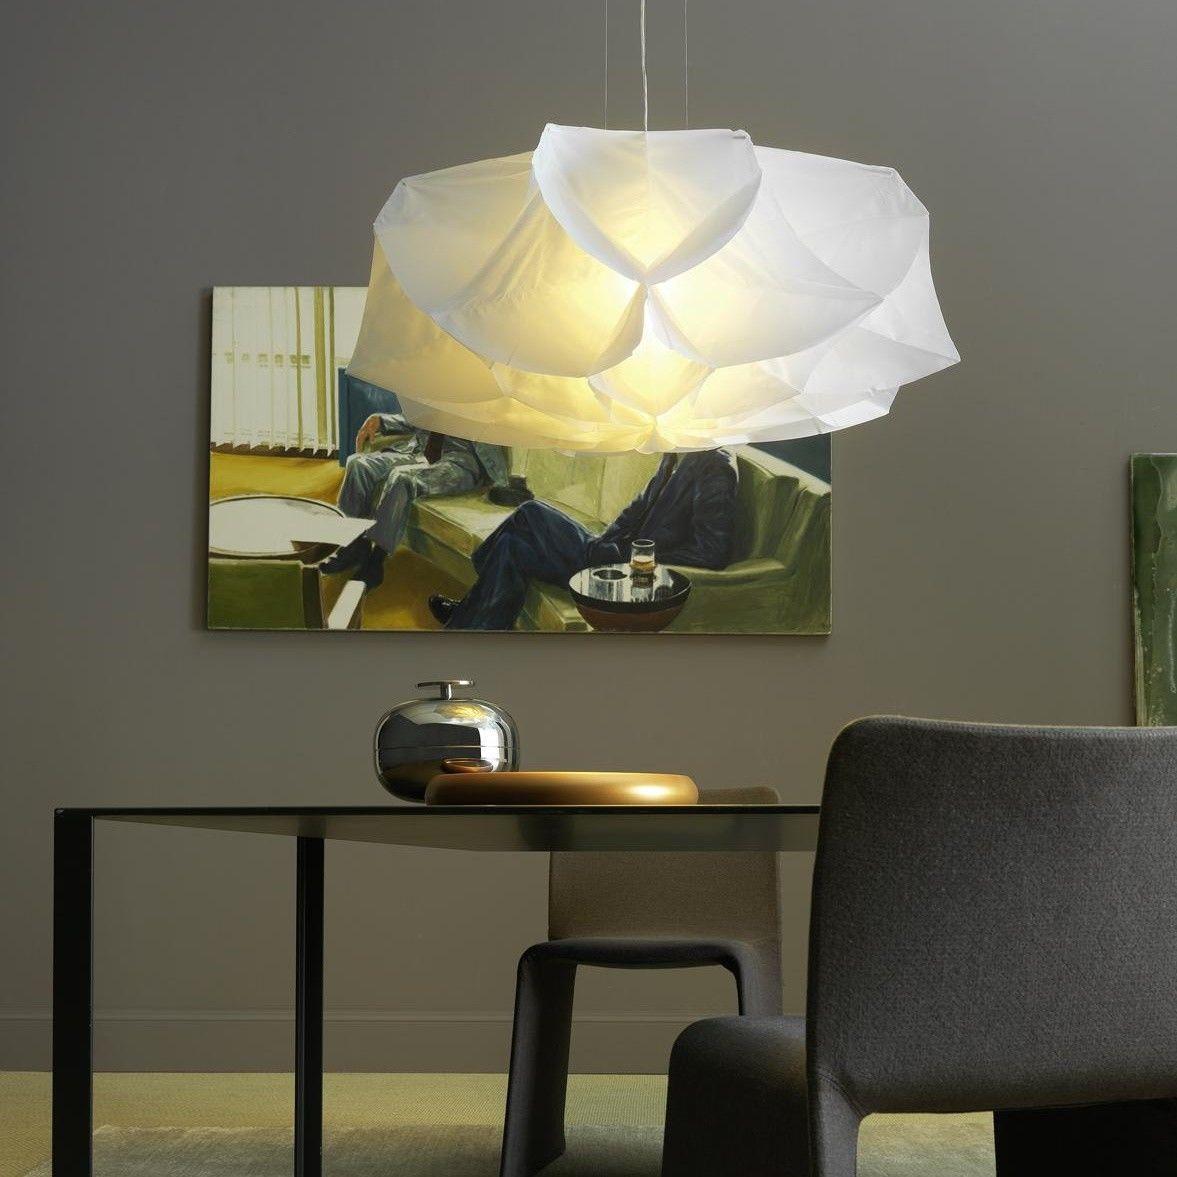 fontana arte lighting. fontana arte - albedo suspension lamp lighting